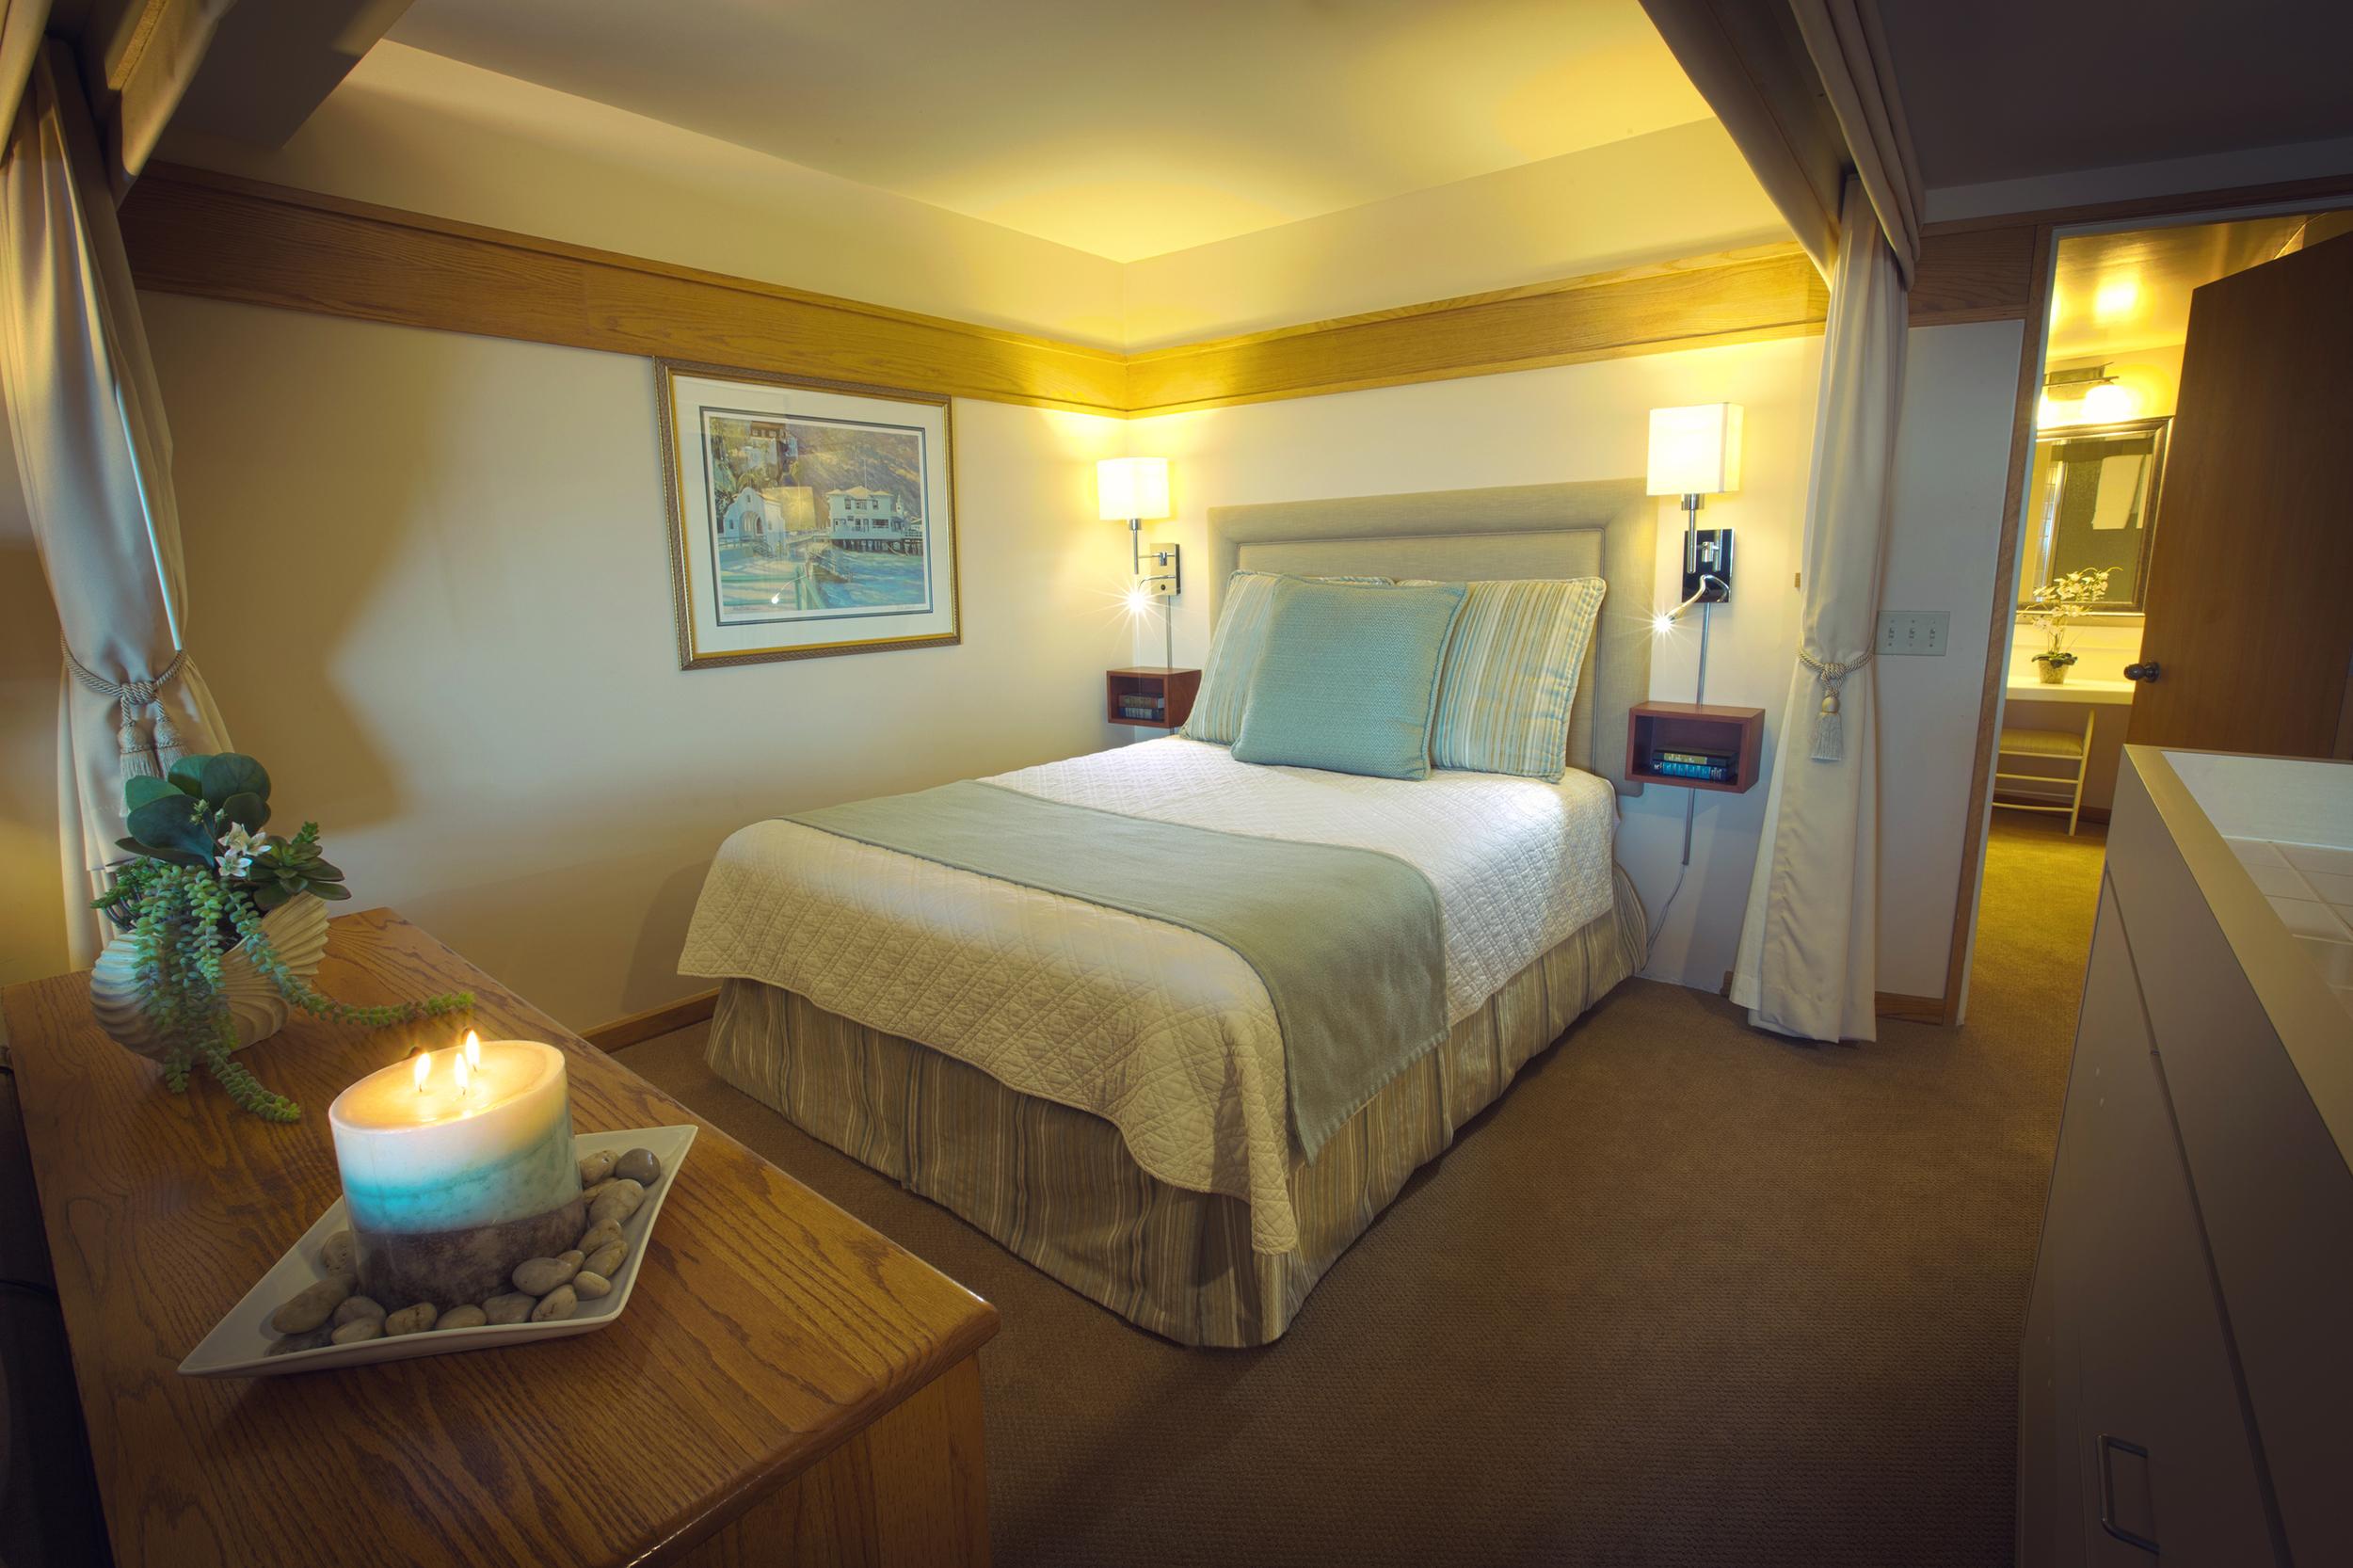 Bedroom_HDR_1_Flat CC.jpg